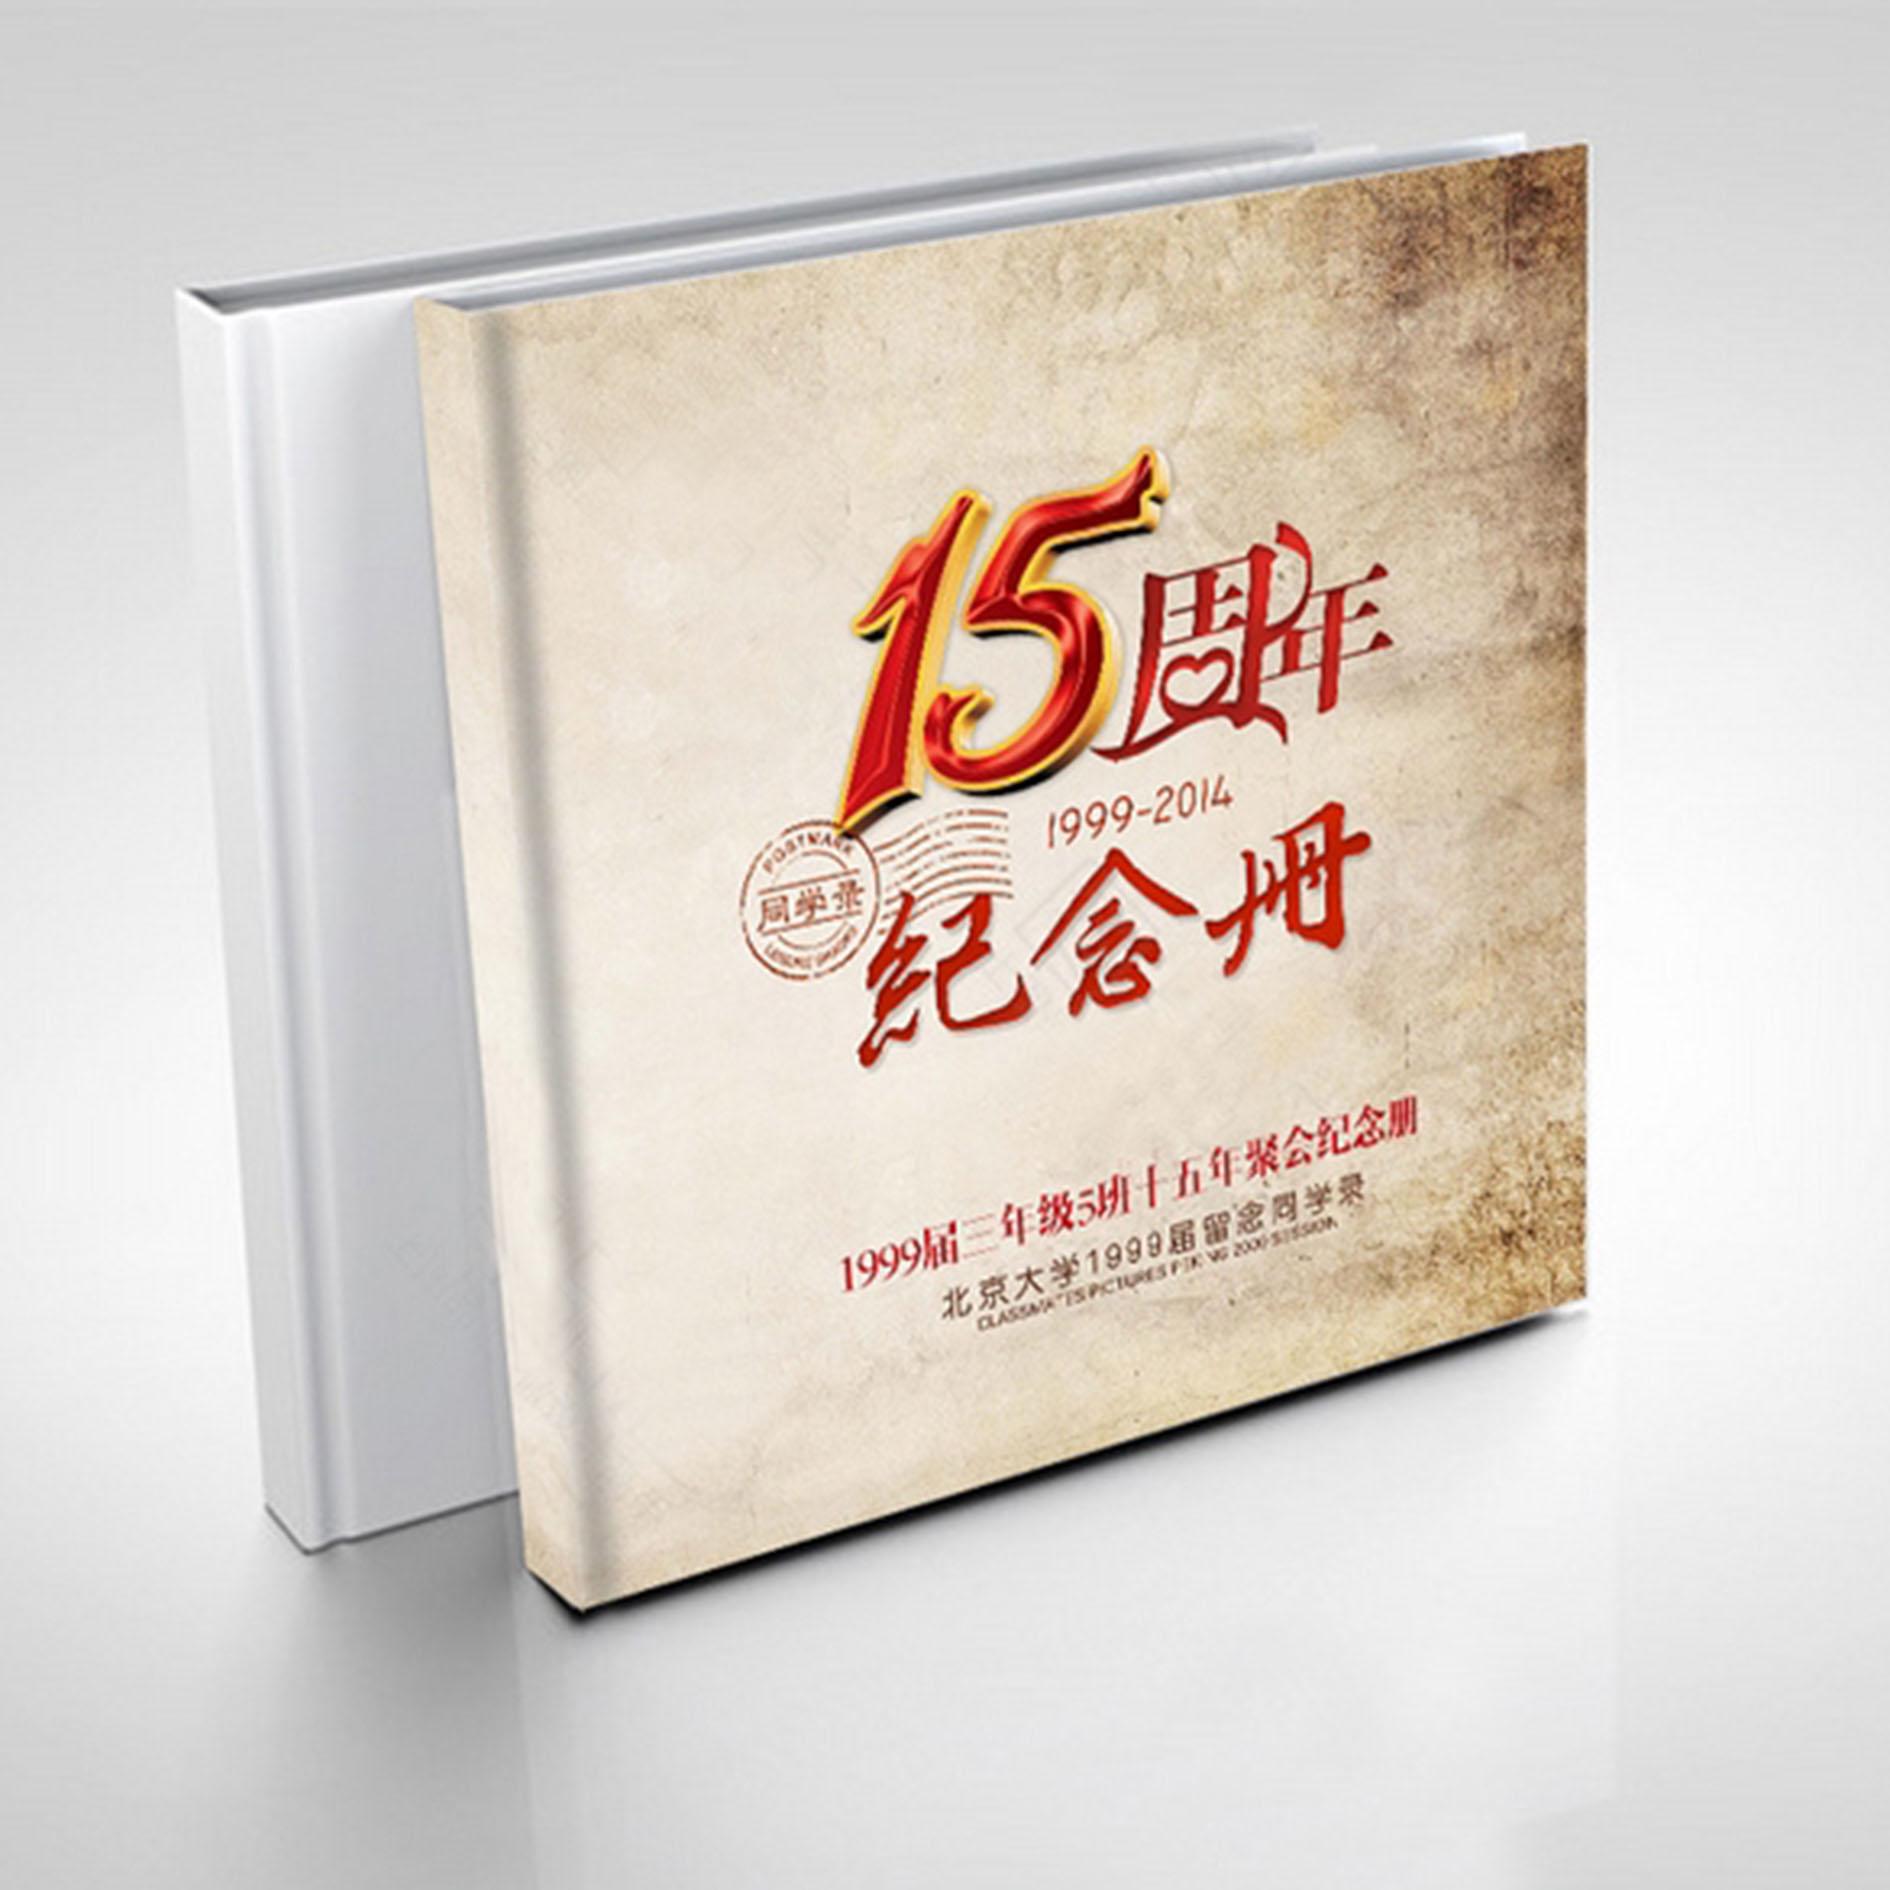 title='聚会纪念册'